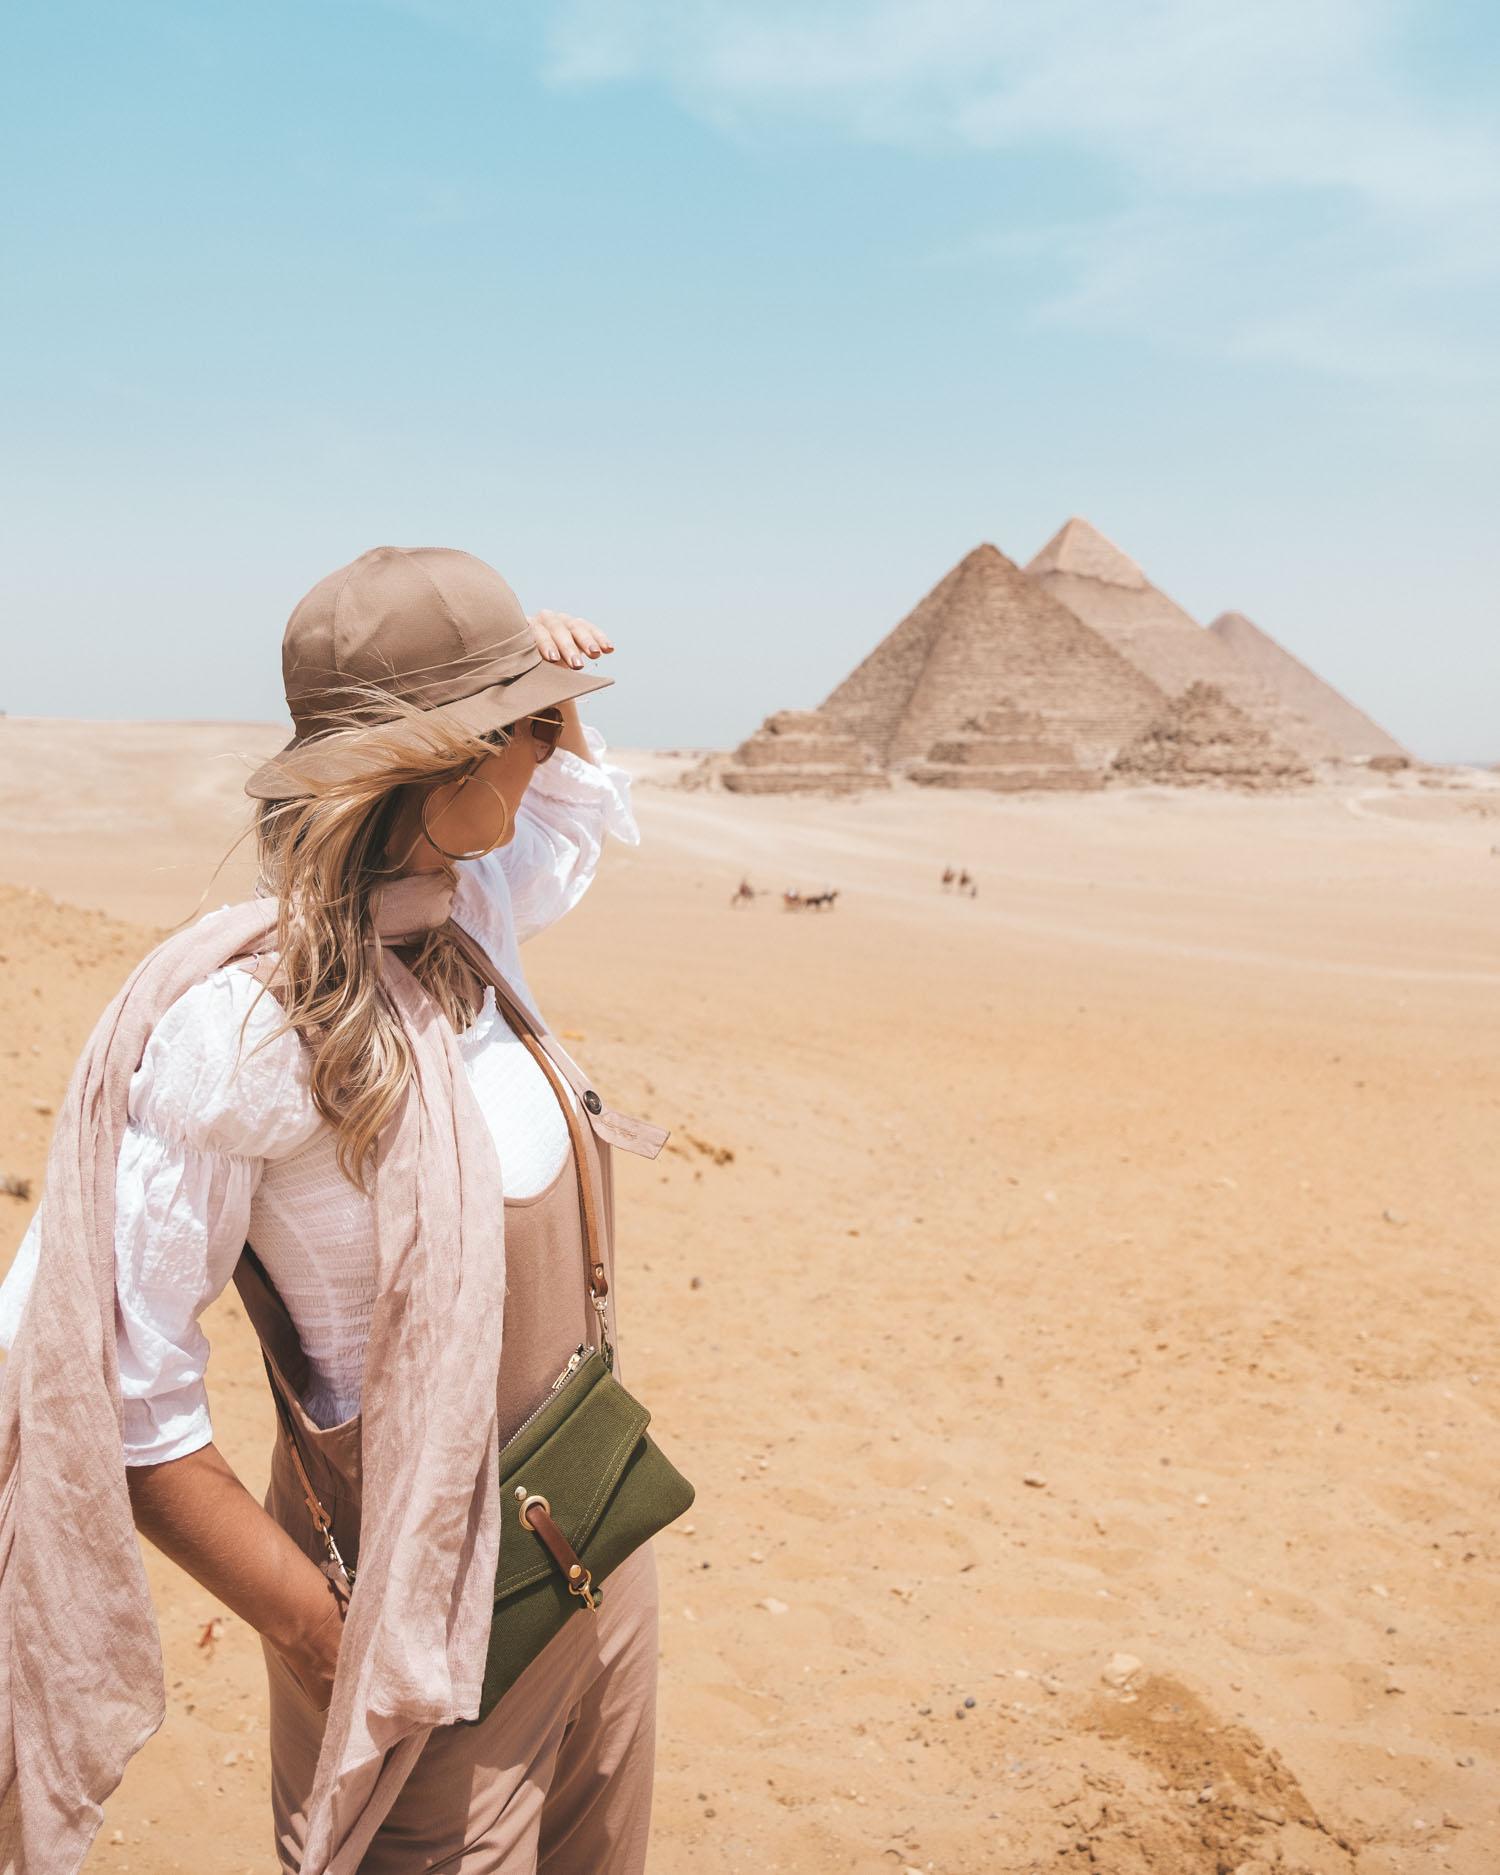 pyramids of giza photo